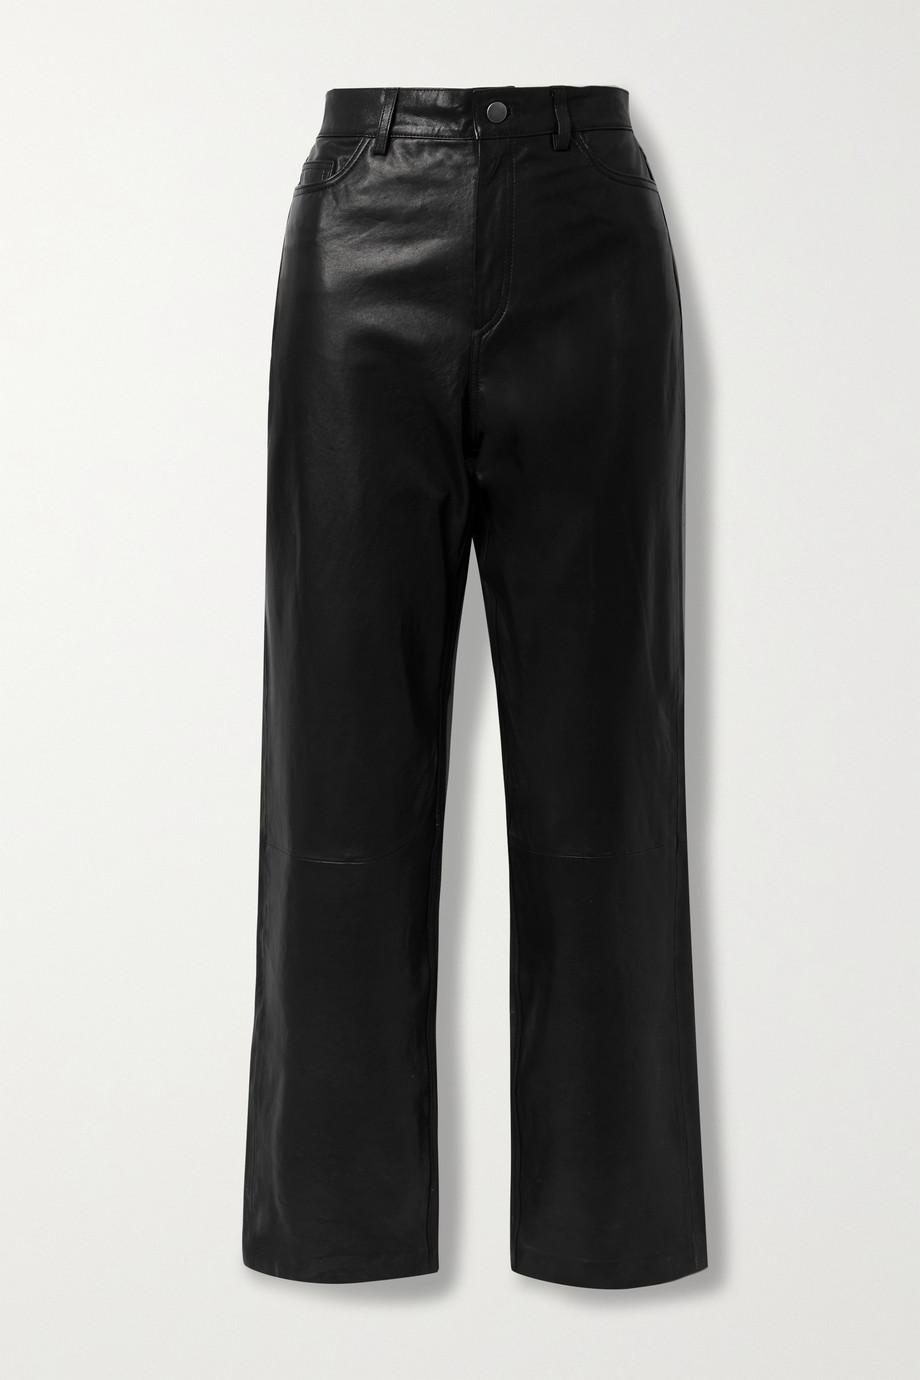 Envelope1976 City leather straight-leg pants